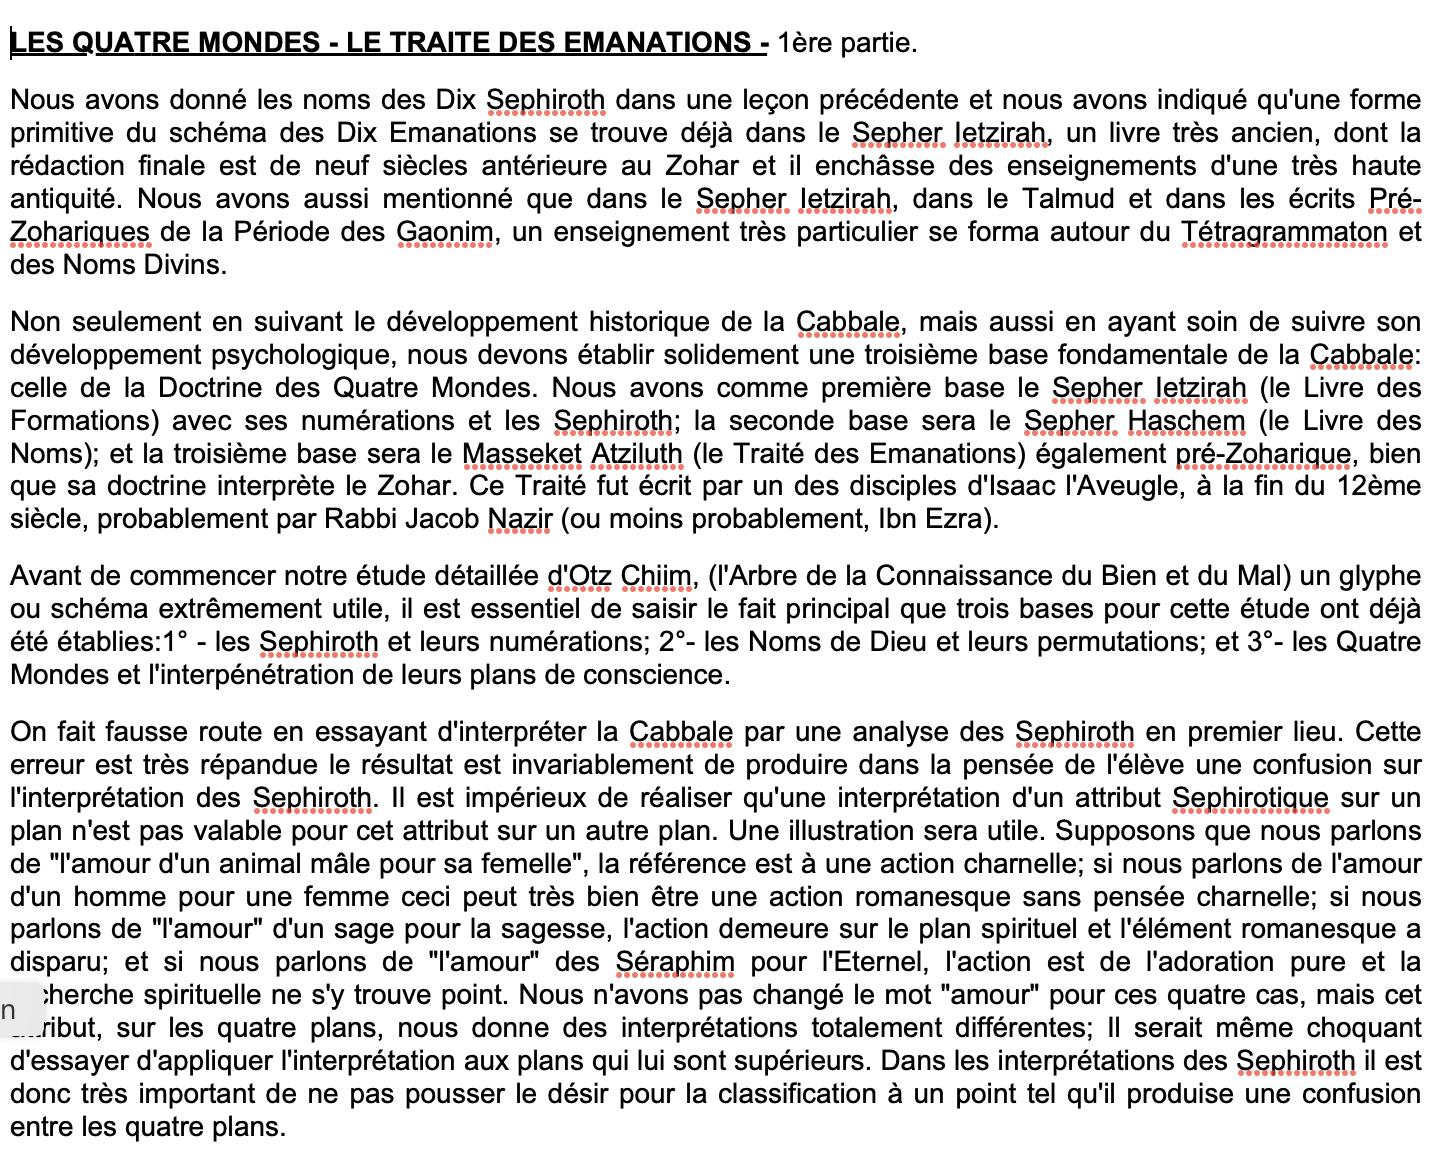 Francis ROLT-WHEELER - Les Quatre Mondes.